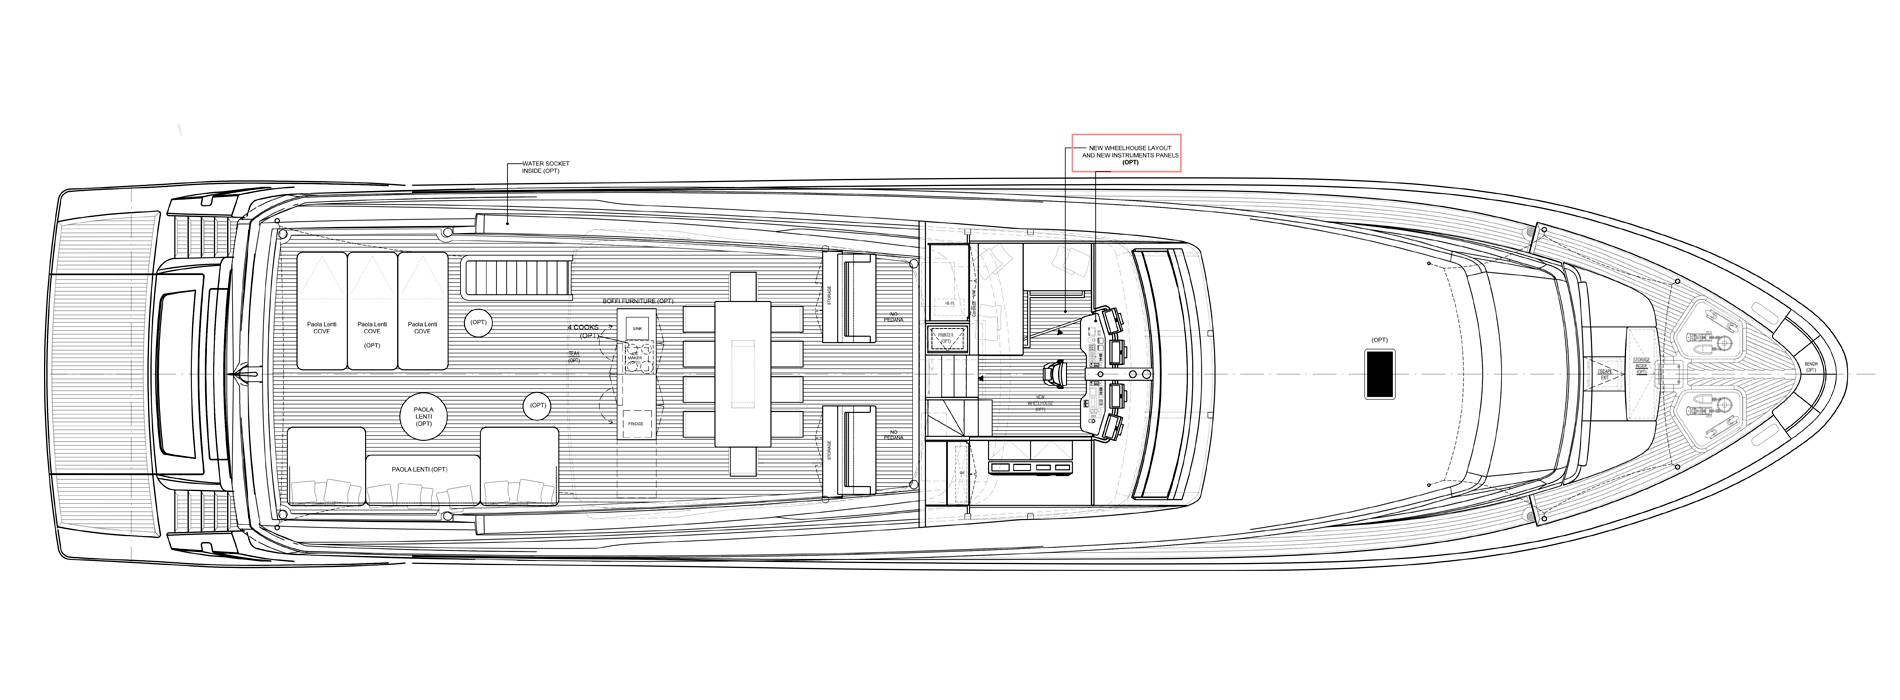 Sanlorenzo Yachts SL106-625 Флайбридж